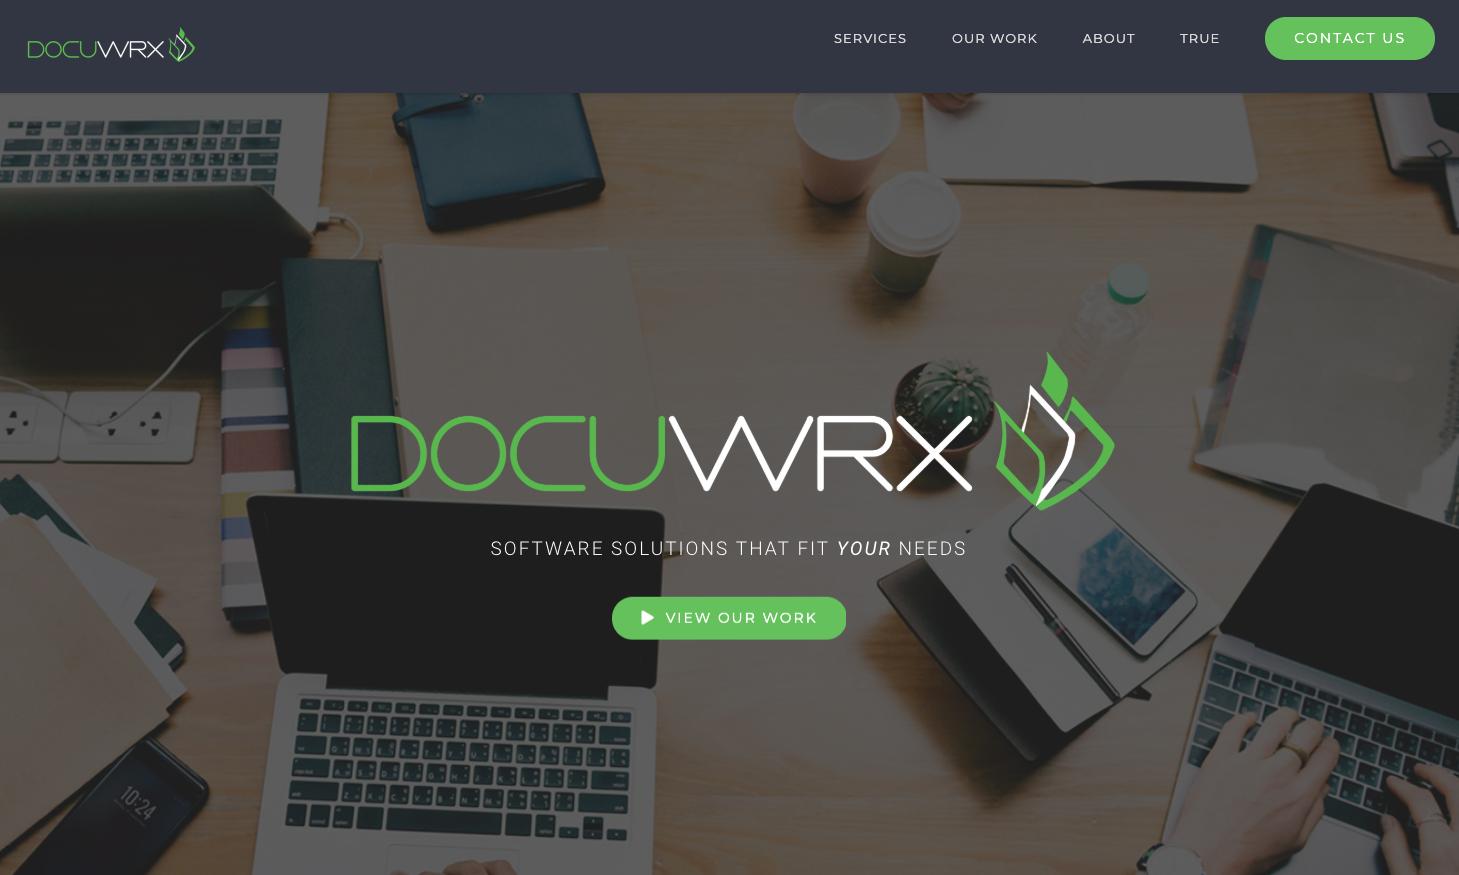 DocuWrx